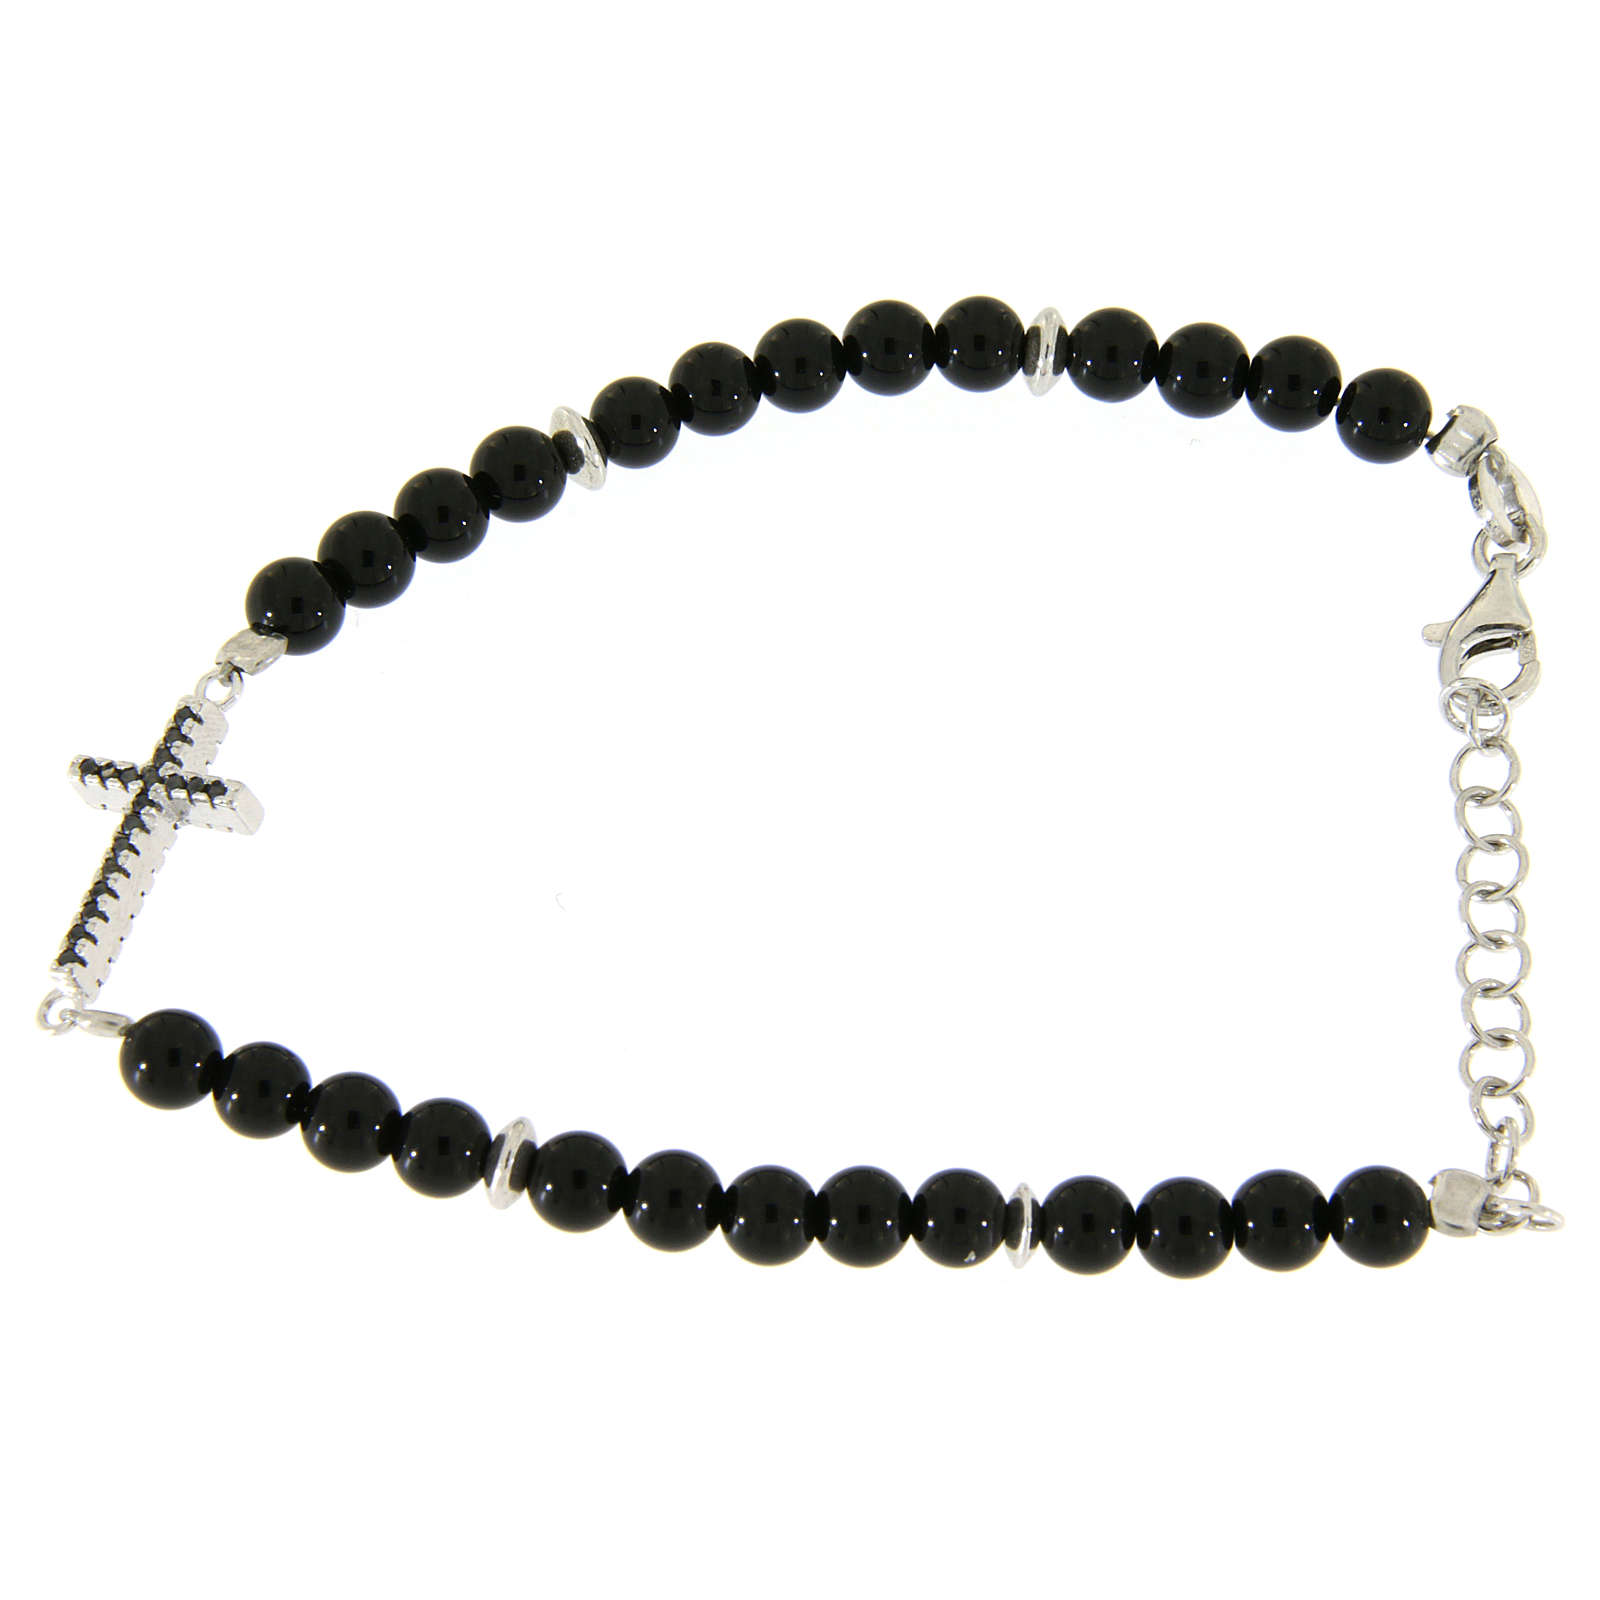 Bracelet with details, cross with black zircons, black shiny onyx balls sized 4,2 mm 4